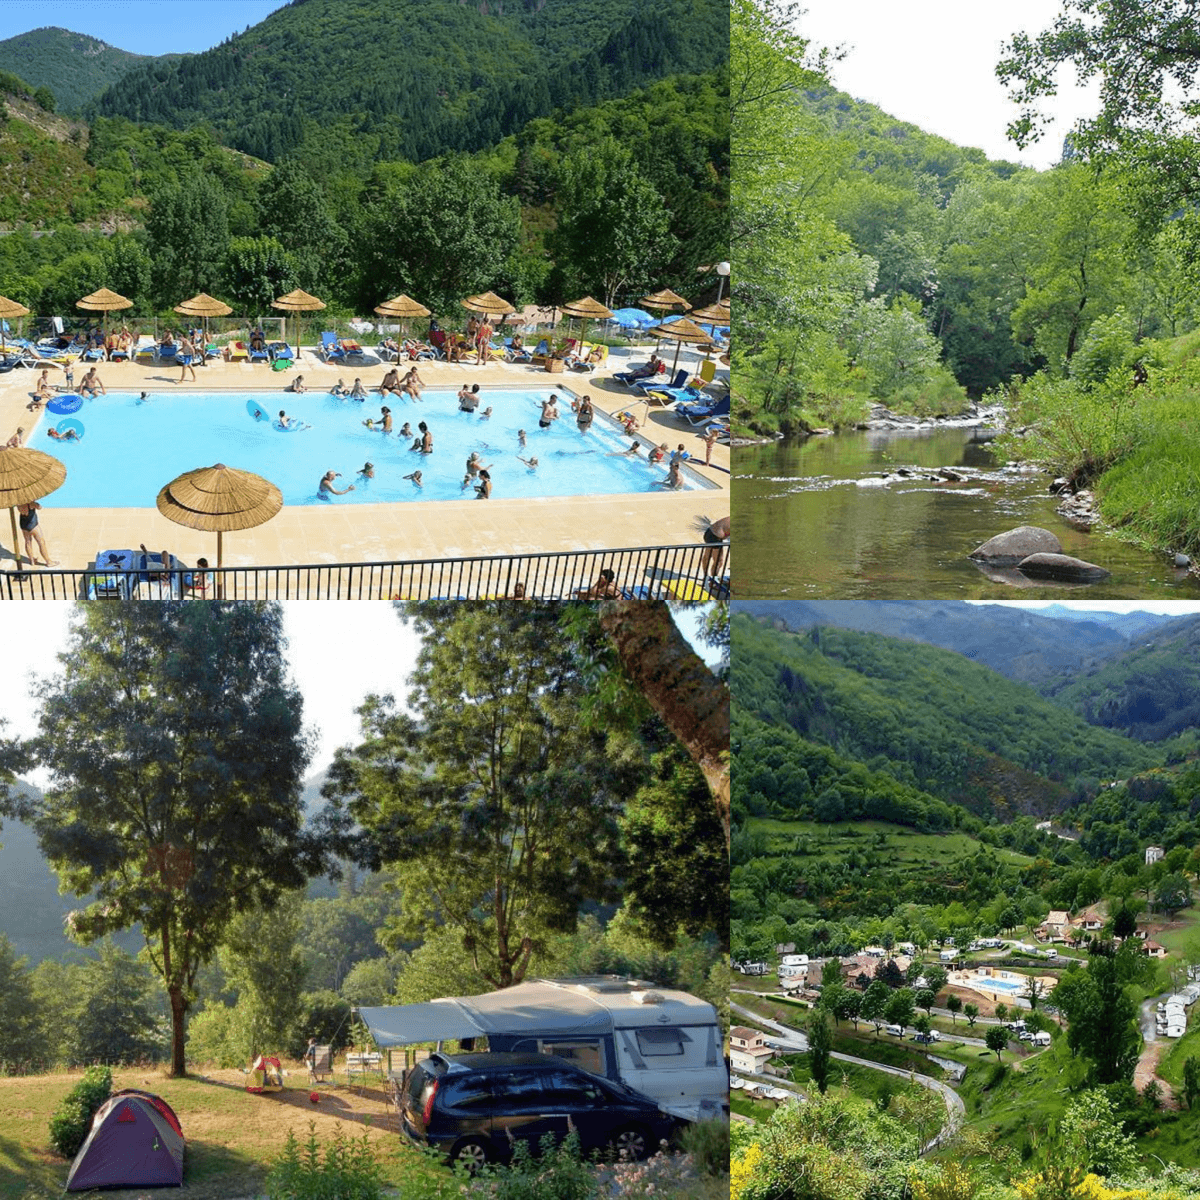 101 leuke idyllische campings in Frankrijk met kids #leukmetkids Camping l'Ardéchois, Saint-Sauveur-de-Montagut, Ardéche, Rhône-Alpes